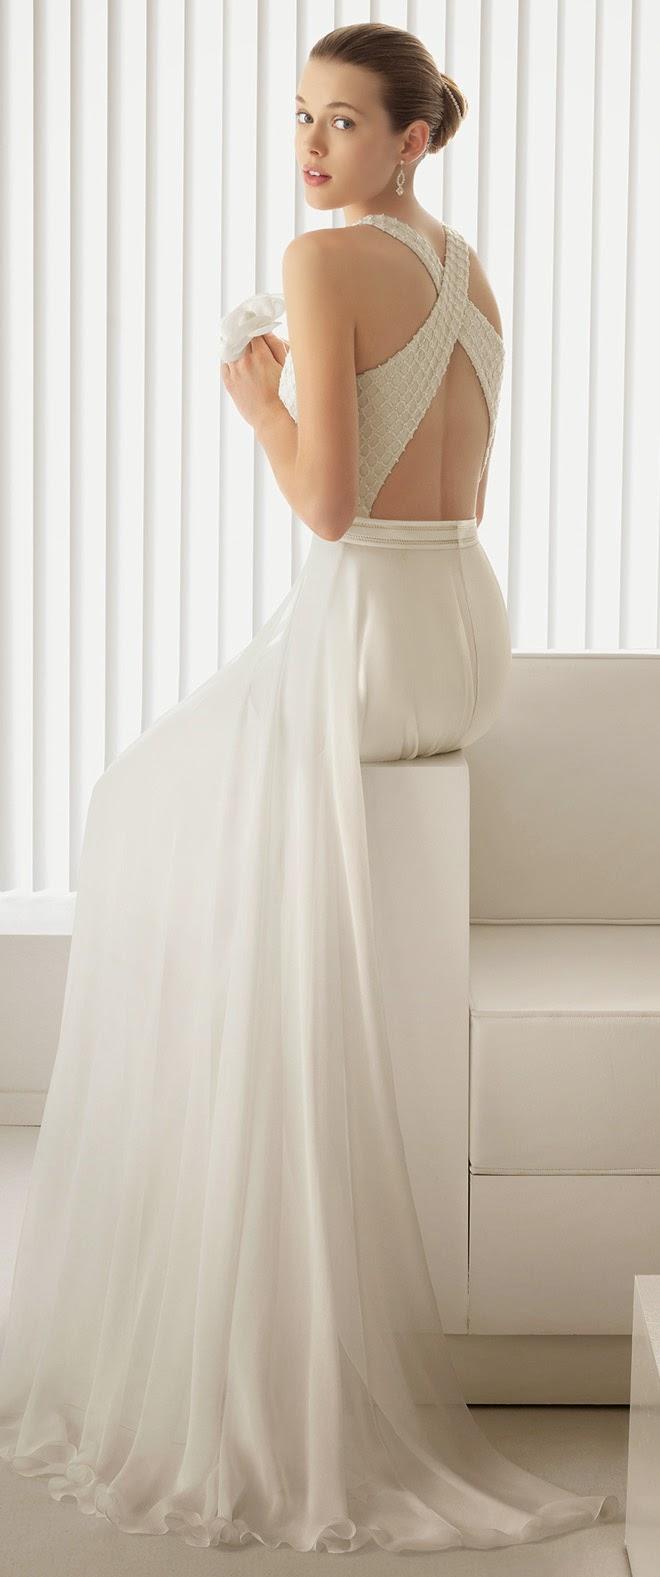 Rosa Clara Wedding Dresses 63 Fabulous Please contact Rosa Clara